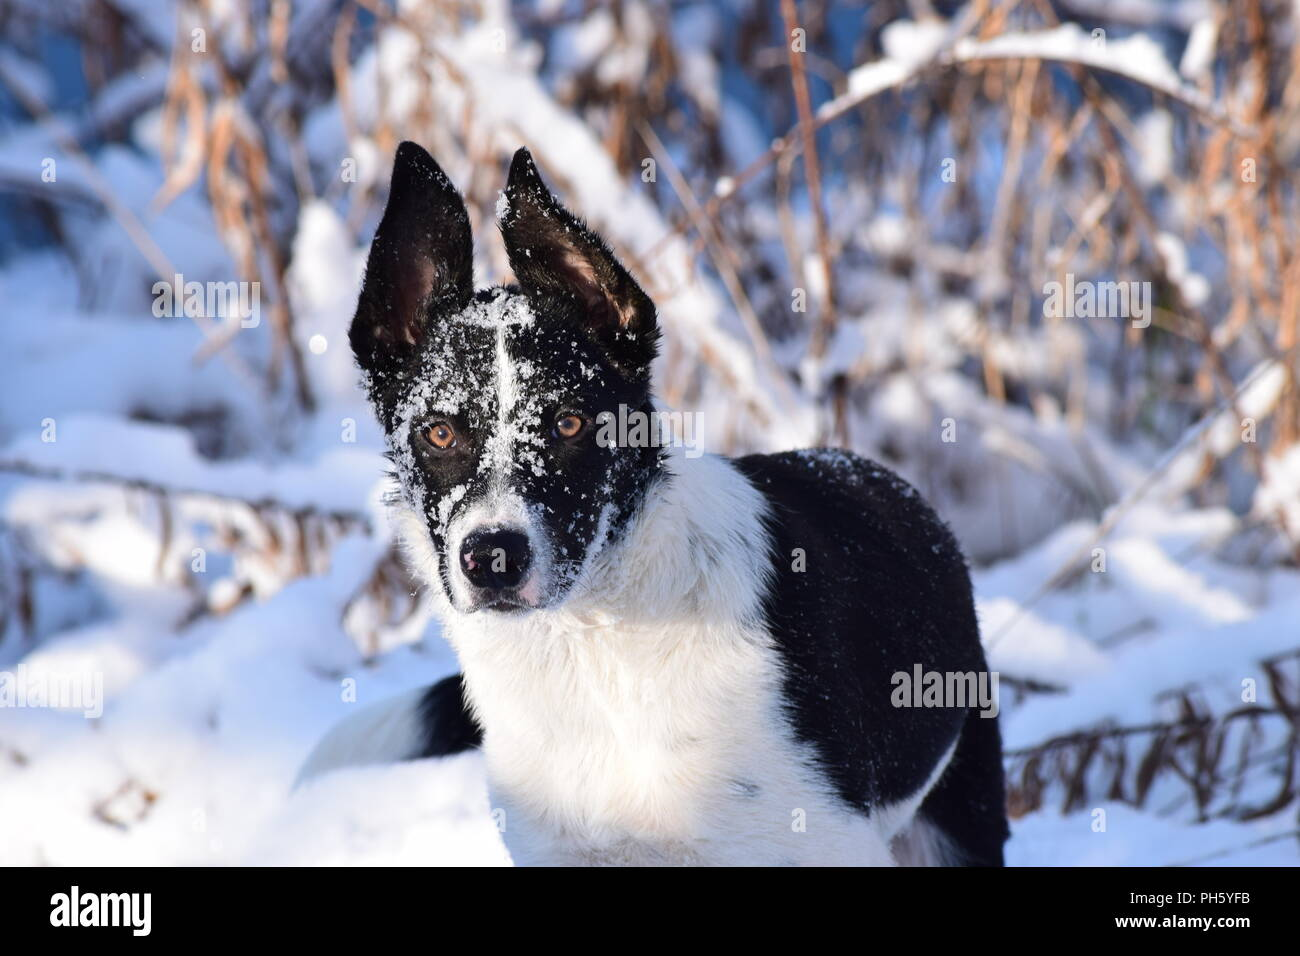 Border Collie in snow portrait - Stock Image